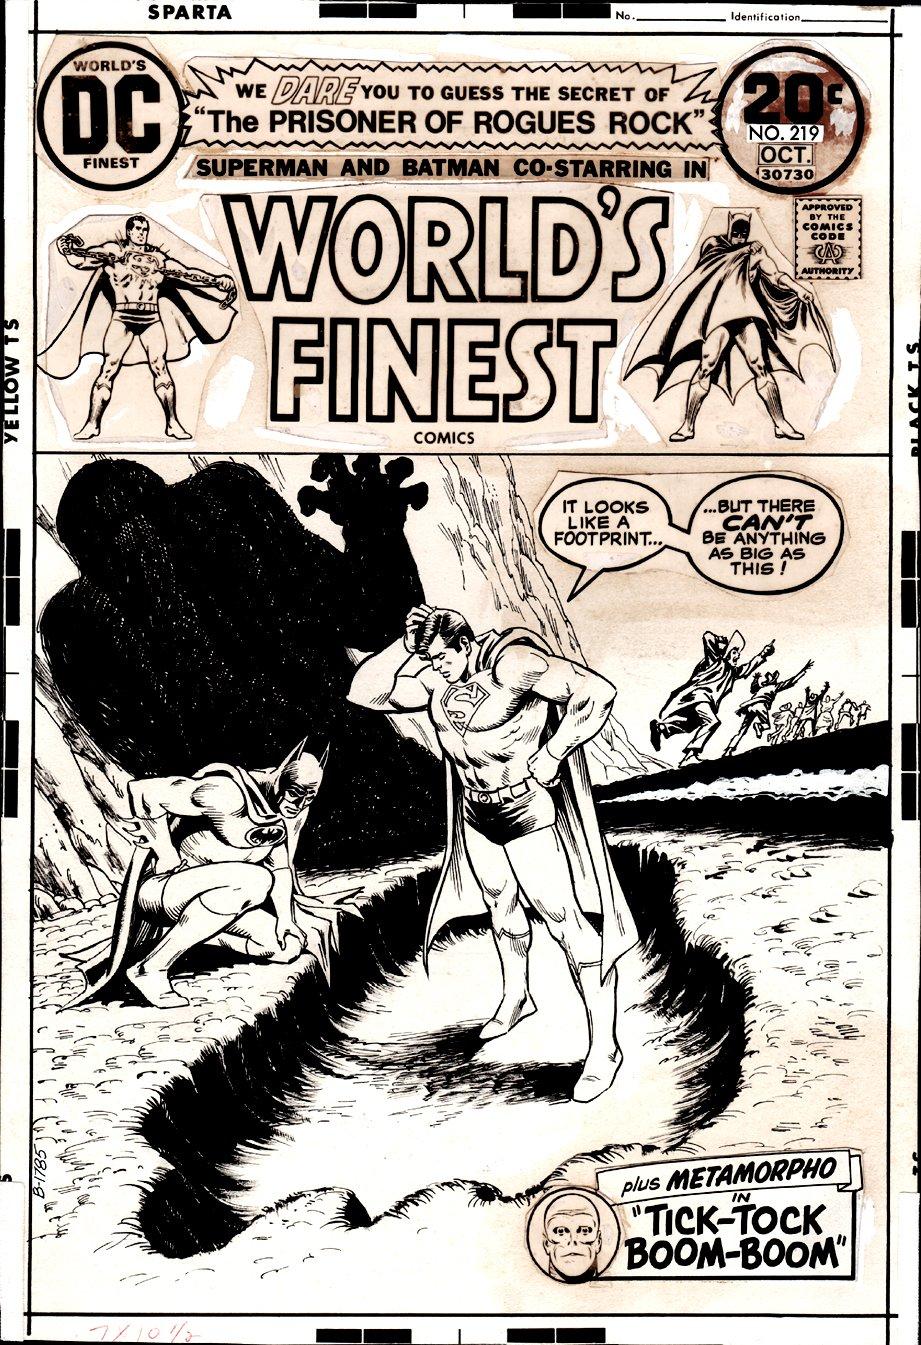 World's Finest Comics #219 Cover (1973)